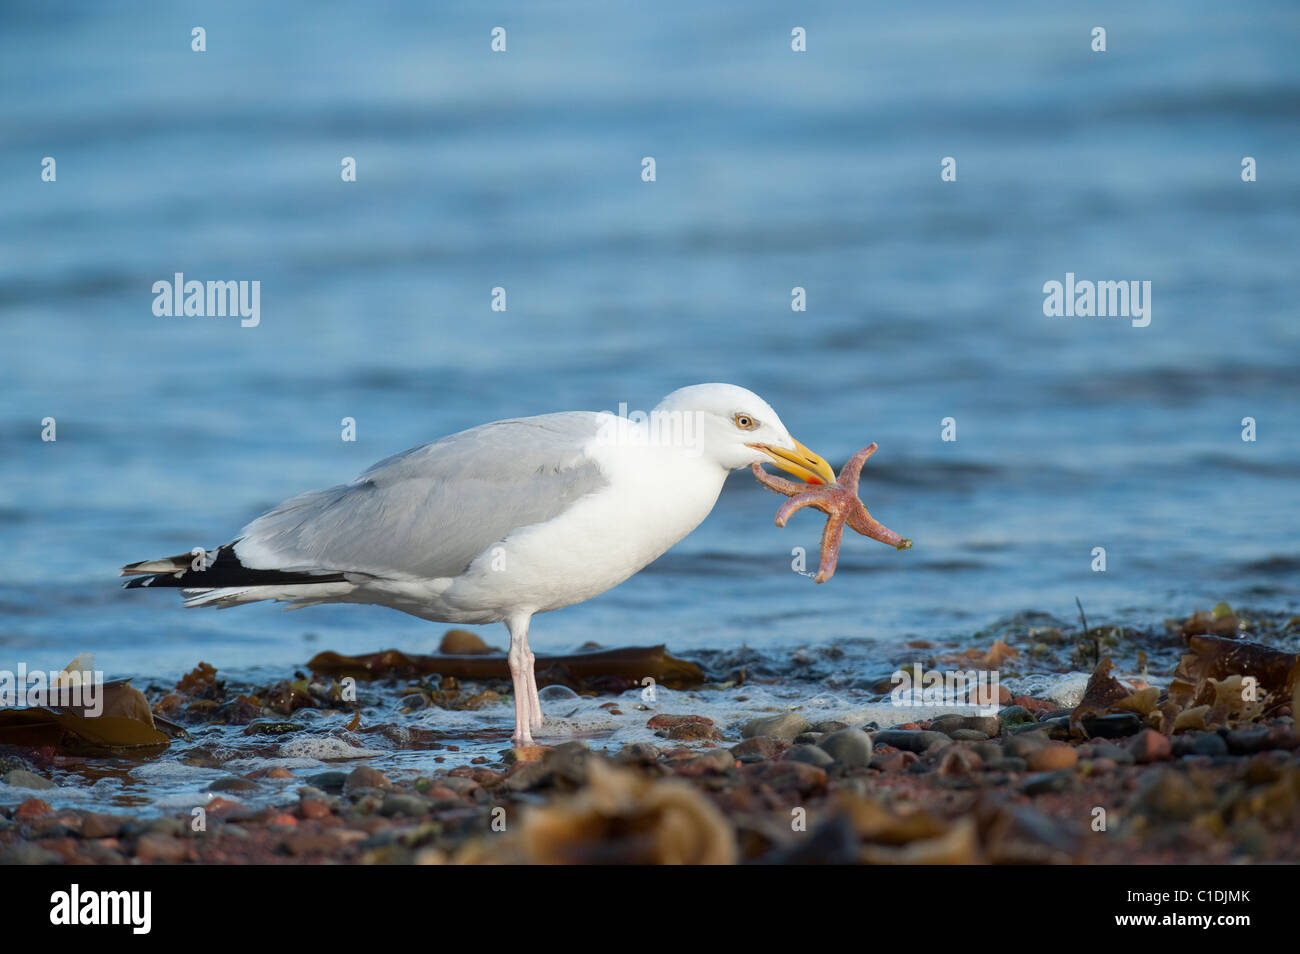 Herring Gull (Larus argentatus) Chanonry Point. Moray Firth, Scotland, UK. Feeding on starfish. - Stock Image